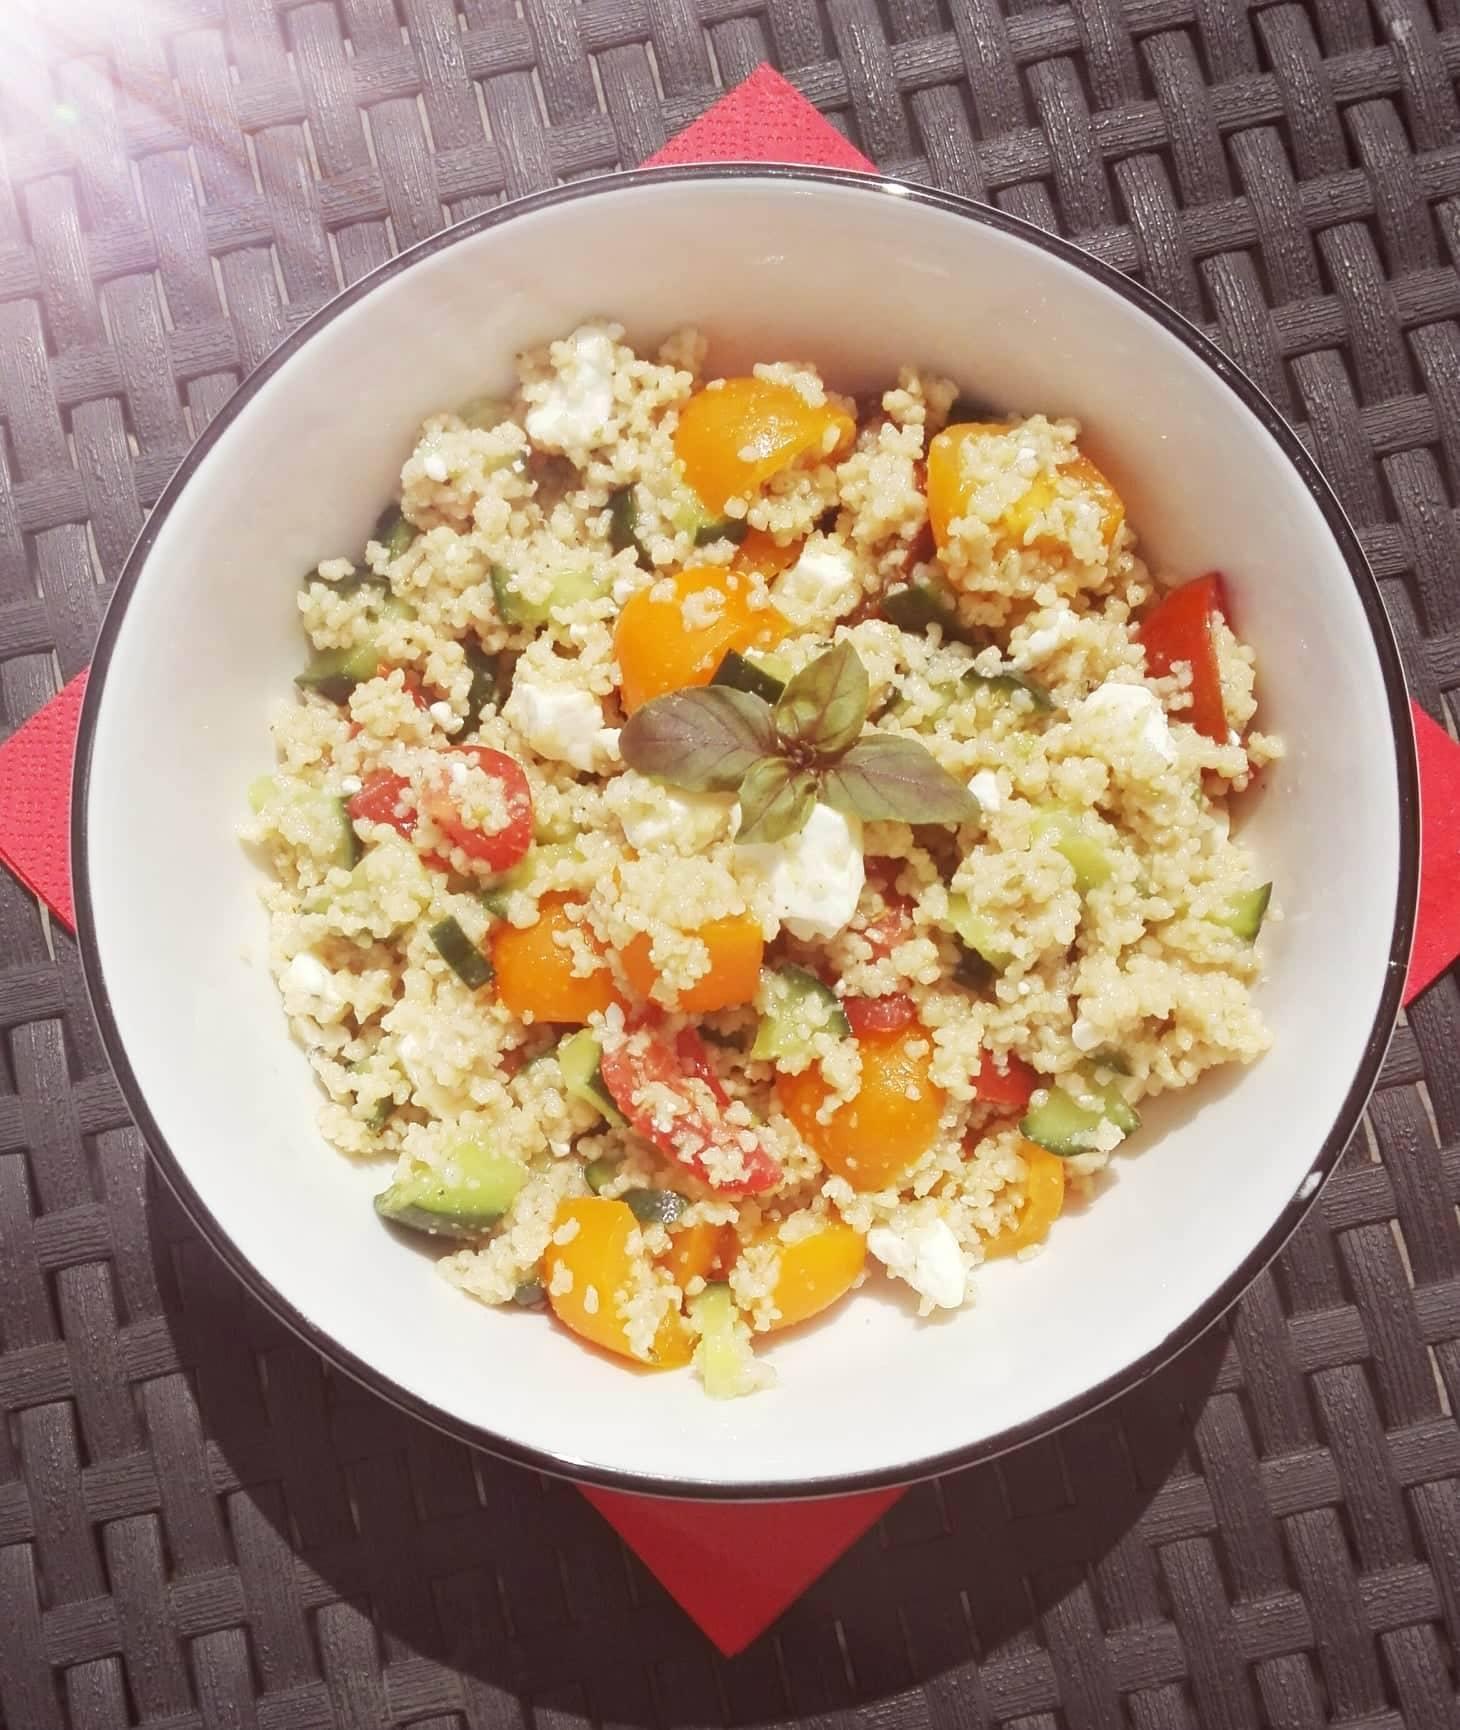 Couscous-Salat – Sommerfrische voller Urlaubsflair